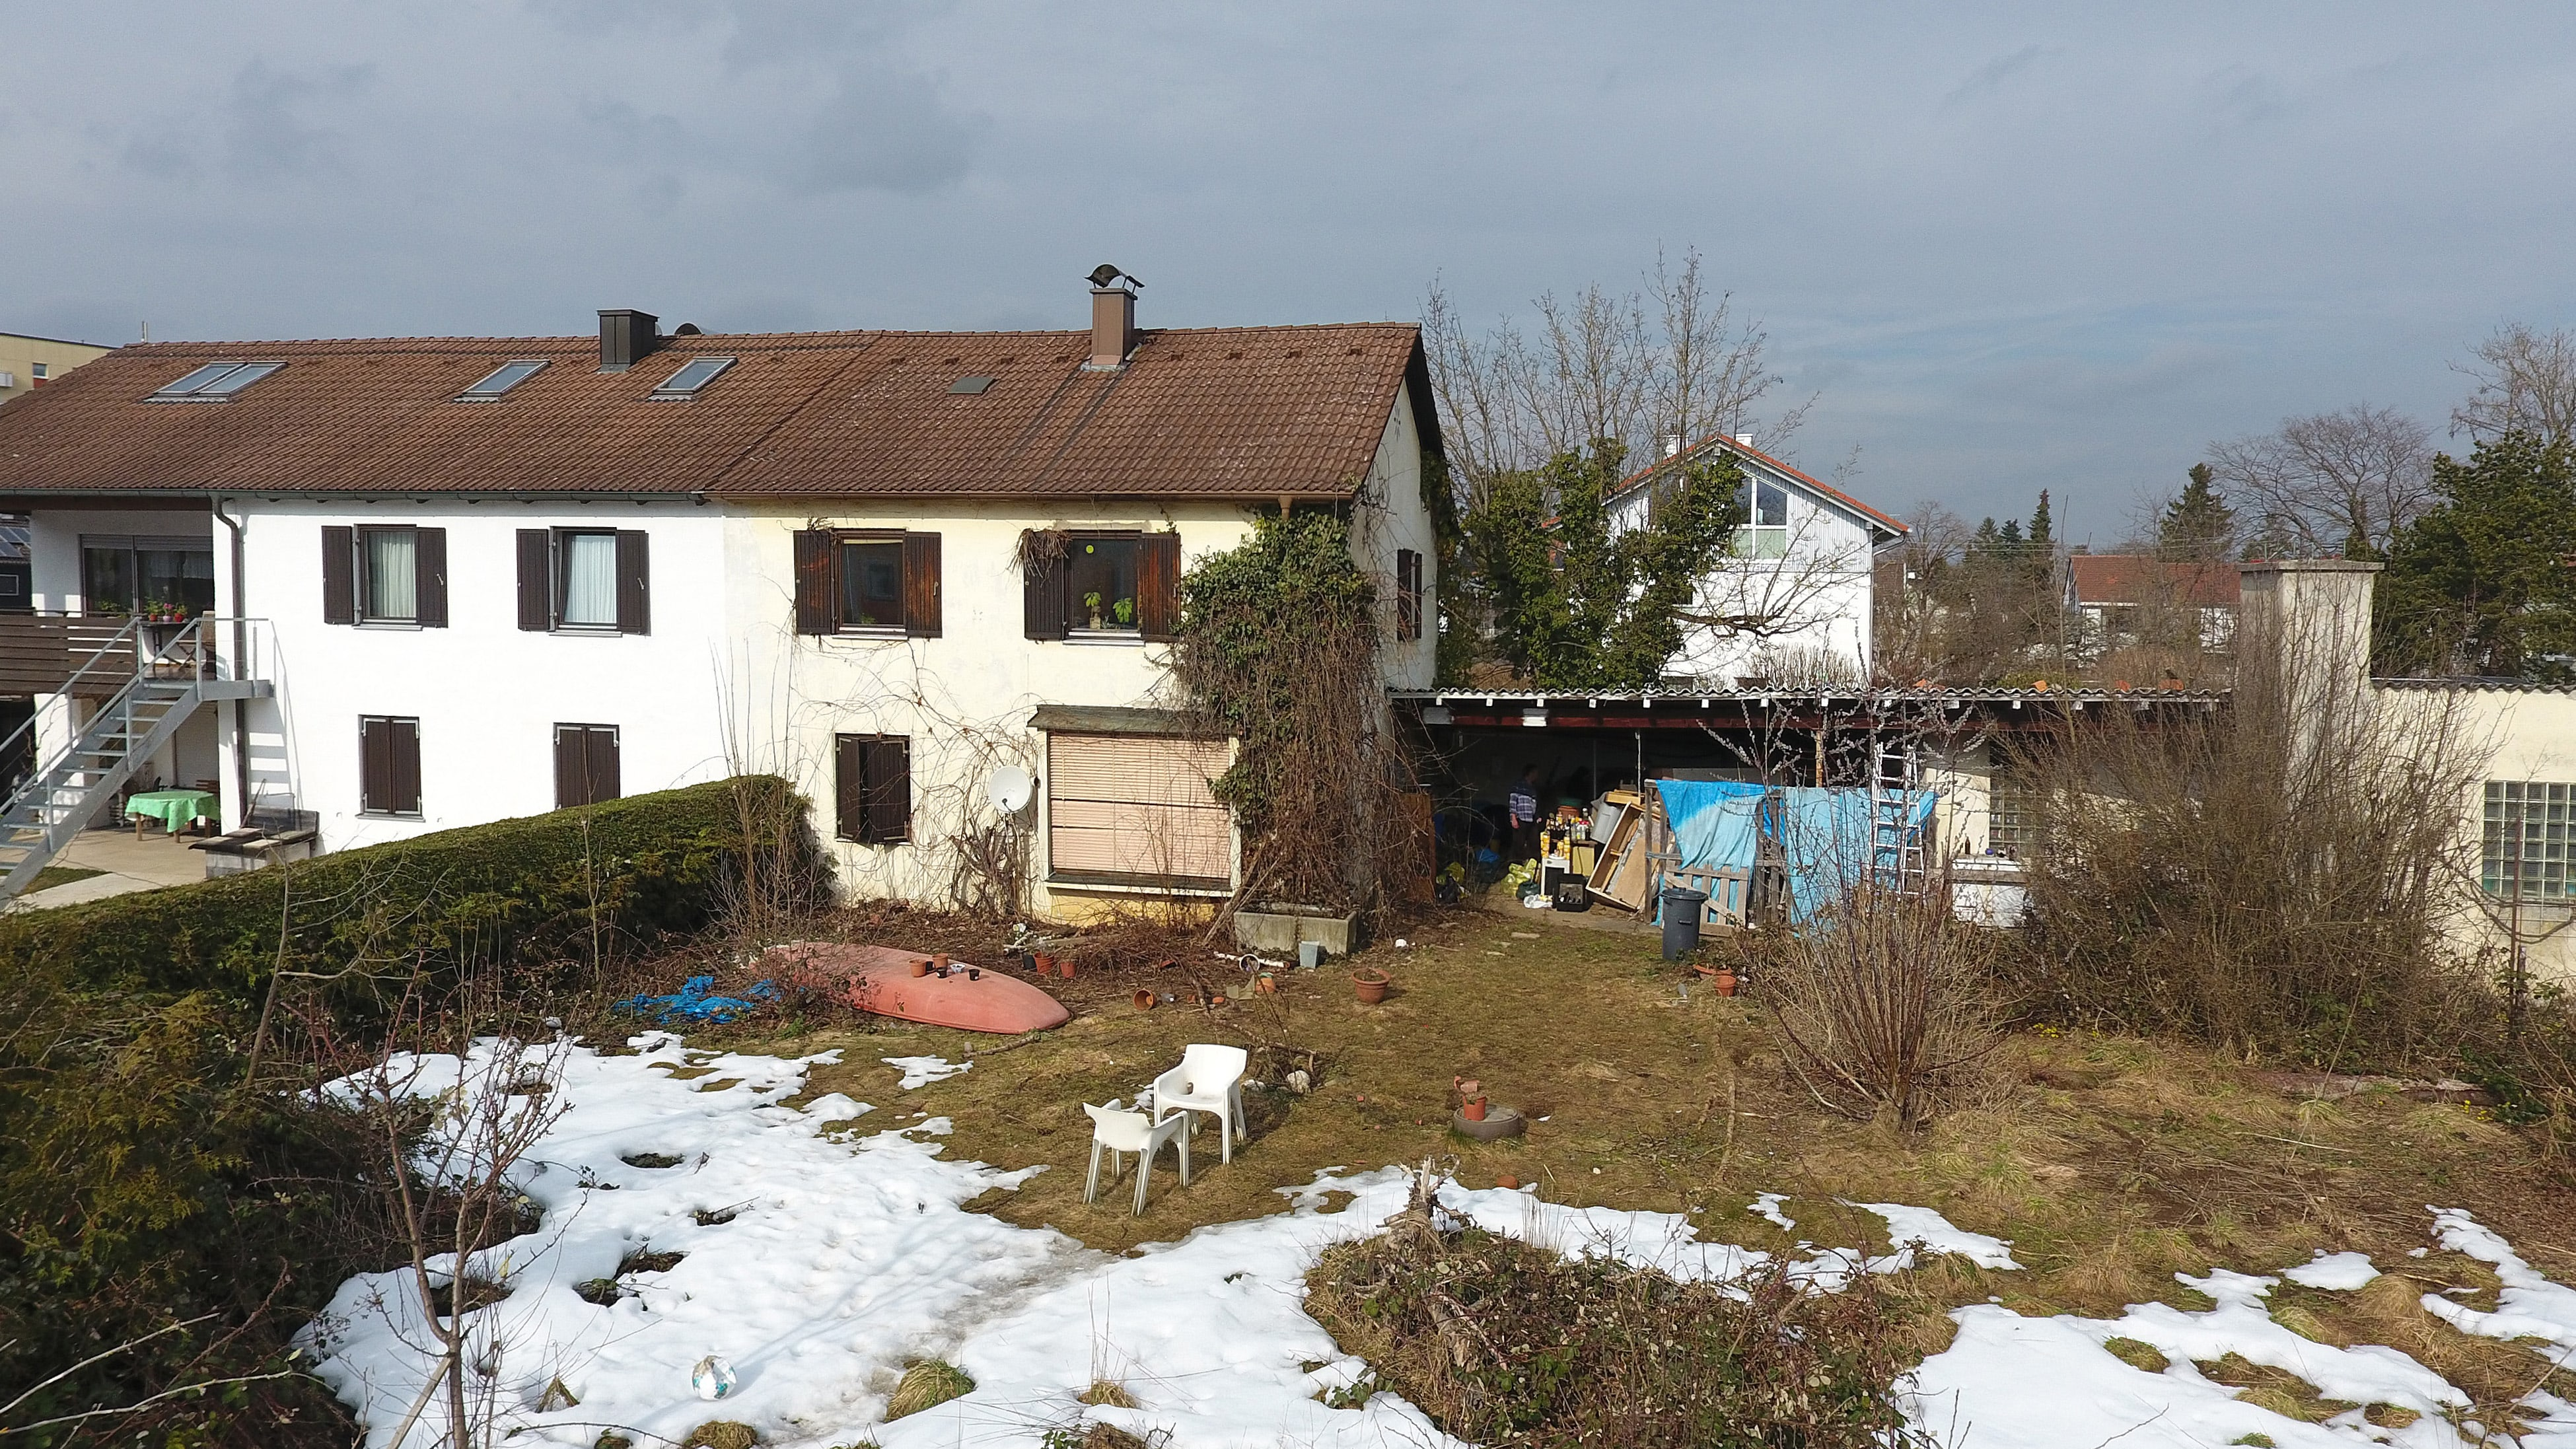 johannsebastianbachstrasse20-0219Blank019-min